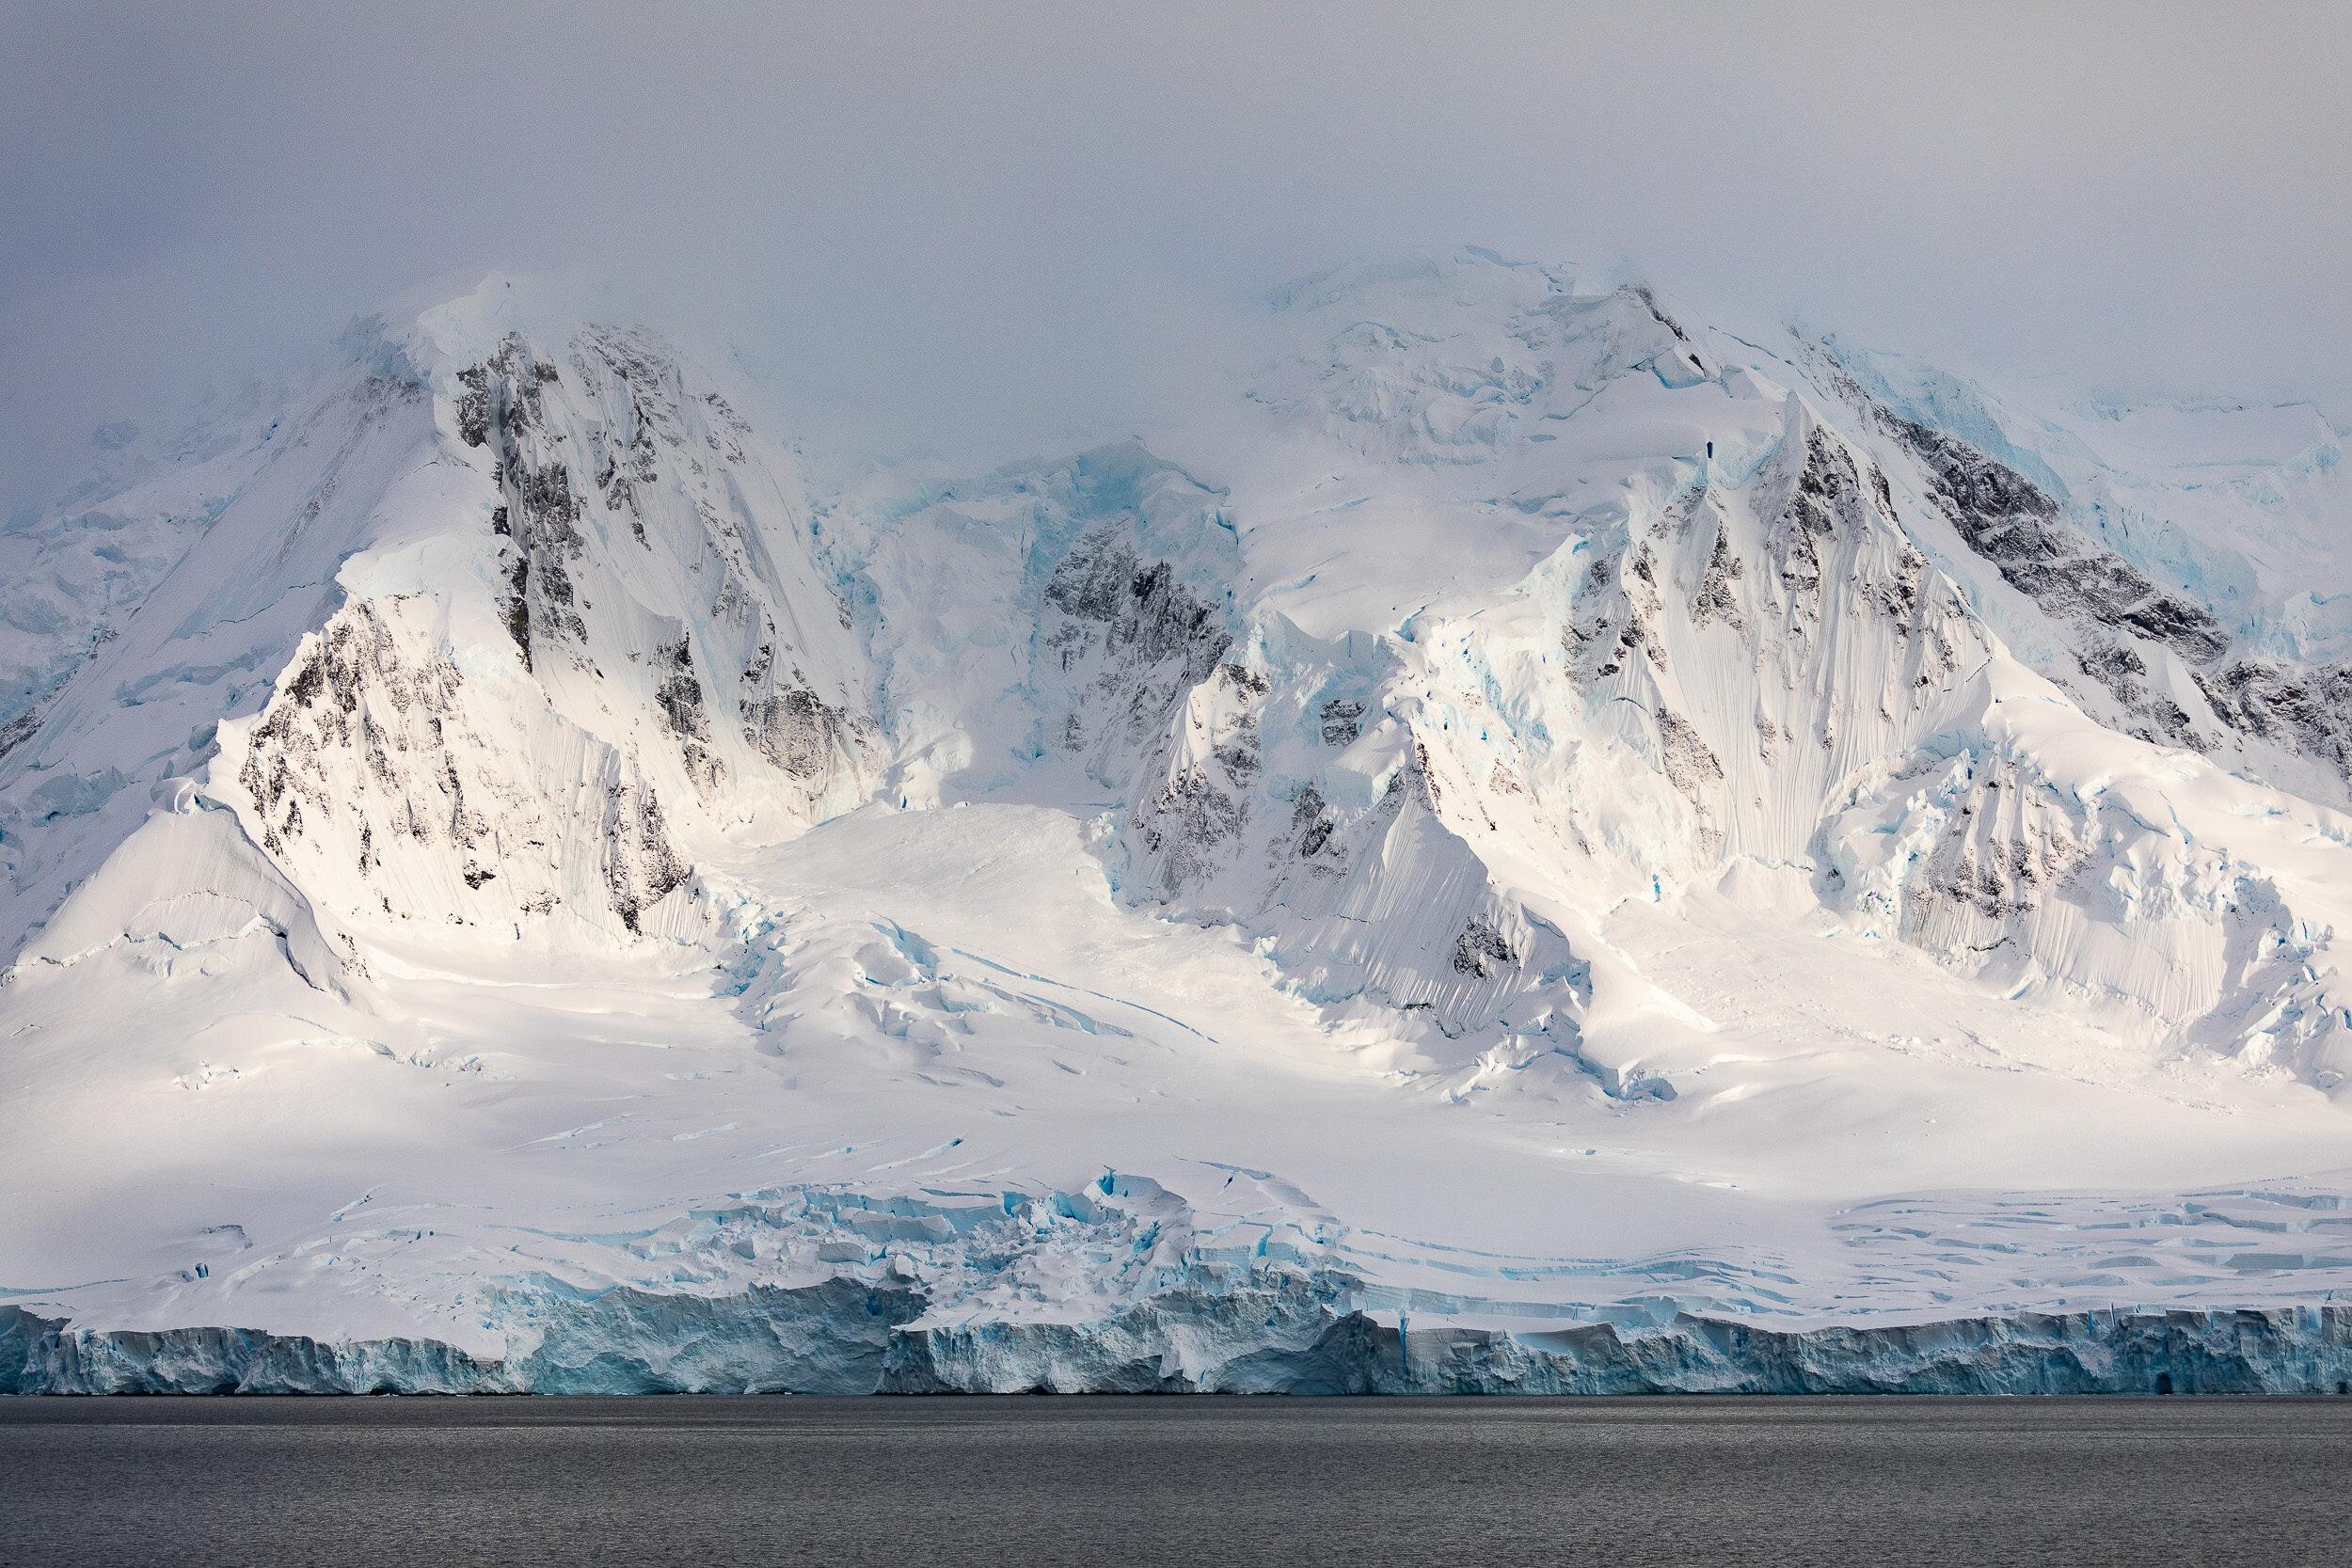 Expedition Snow Desert - An Antarctic Journey